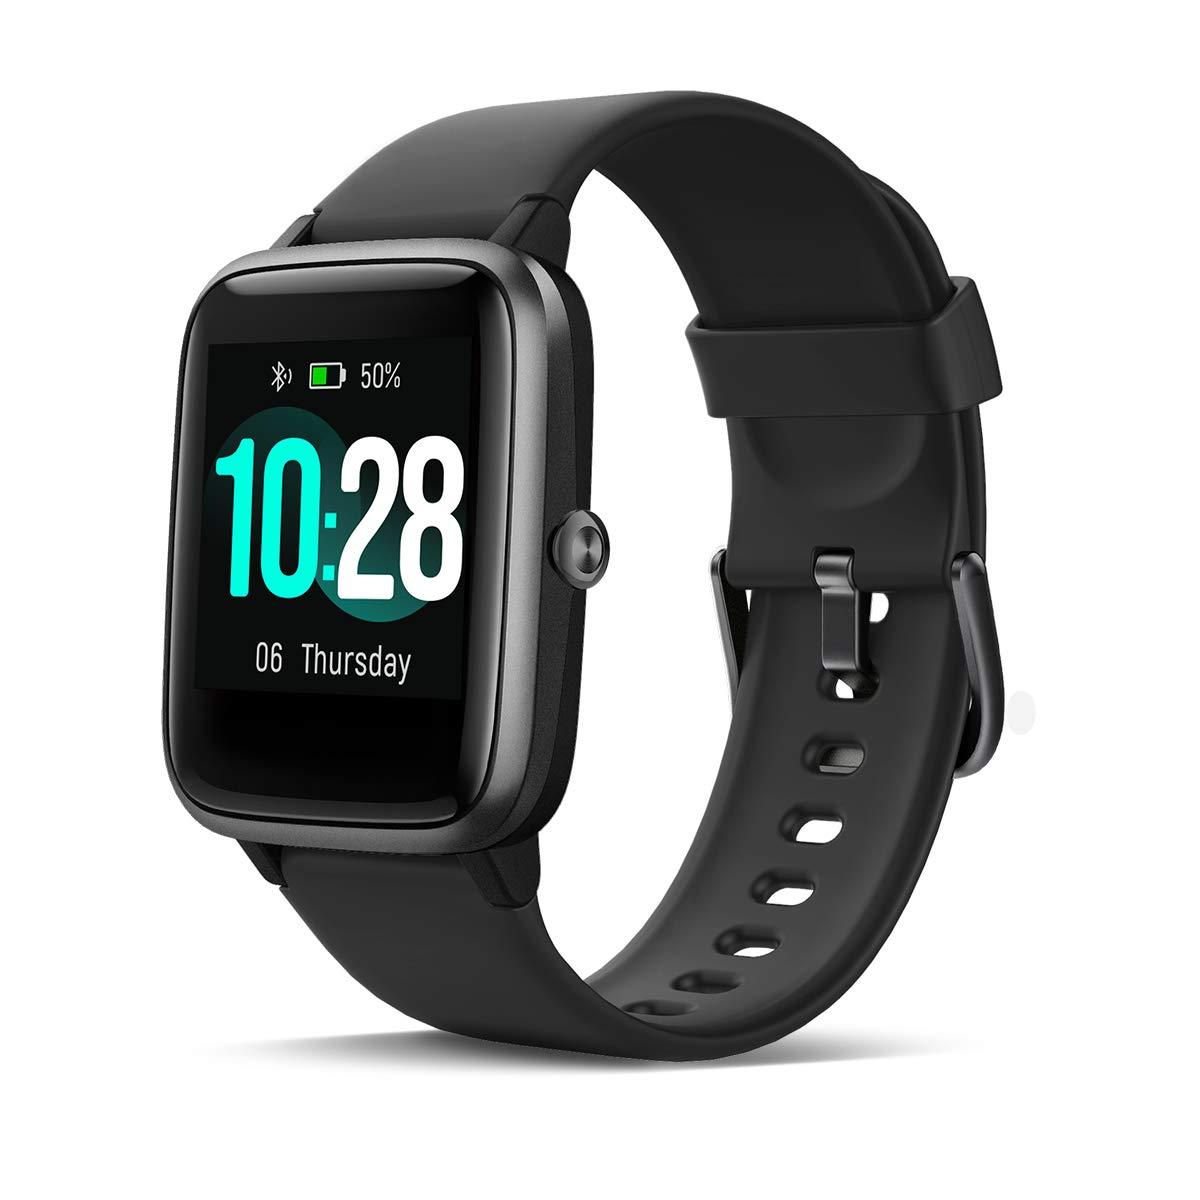 HOMVILLA Smartwatch, Fitness Tracker, Reloj Inteligente Impermeable IP68 Fitness con Monitor de Ritmo Cardíaco Podómetro… 1